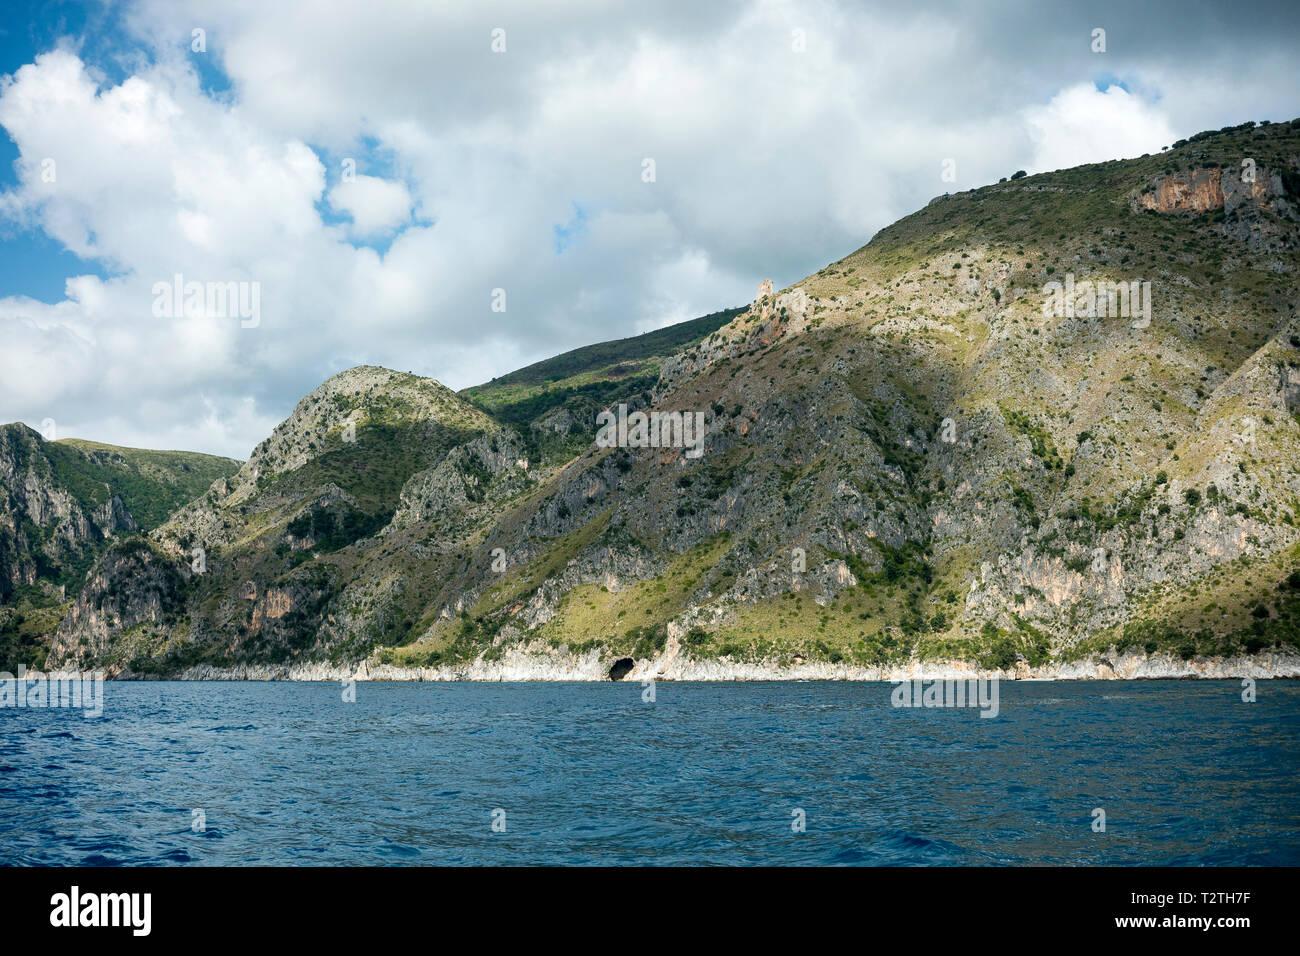 Italy, Campania, Cilento National Park,  Masseta and Infreschi Marine protected area, sea cliff - Stock Image